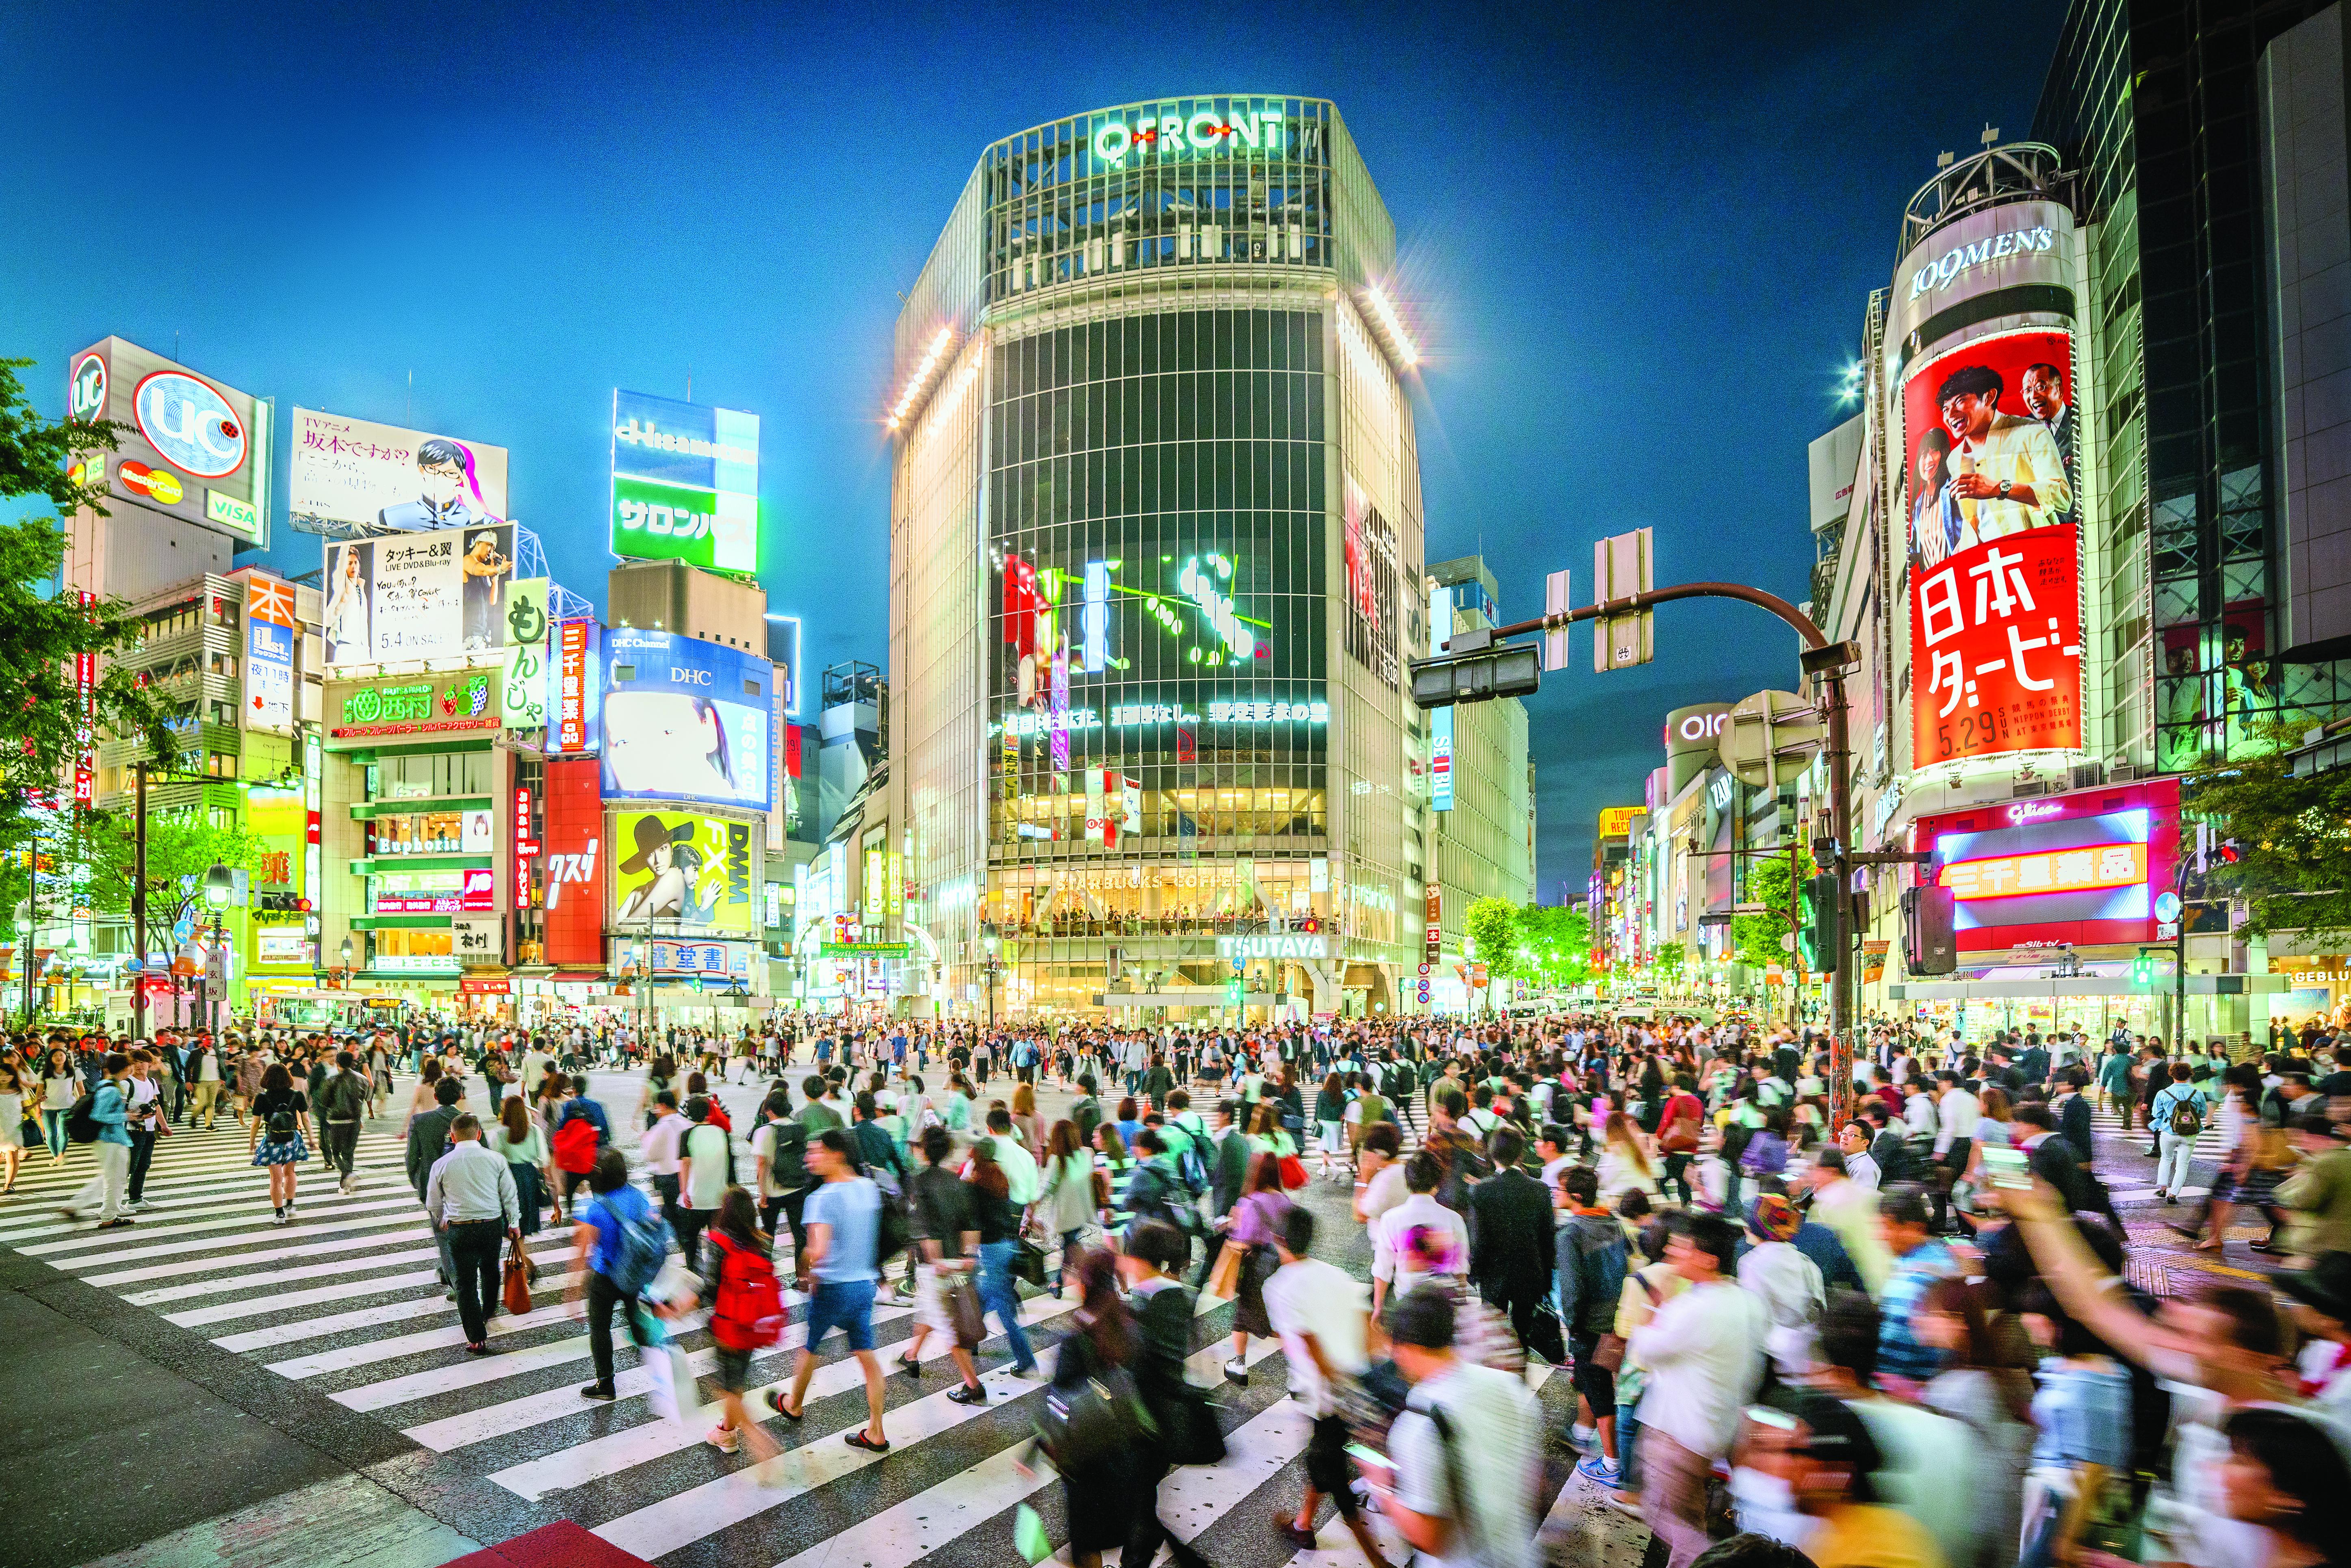 Summer Program - Japanese | CIEE High School Summer Abroad: Japanese Pop Culture - Anime, Manga & Gaming - in Tokyo